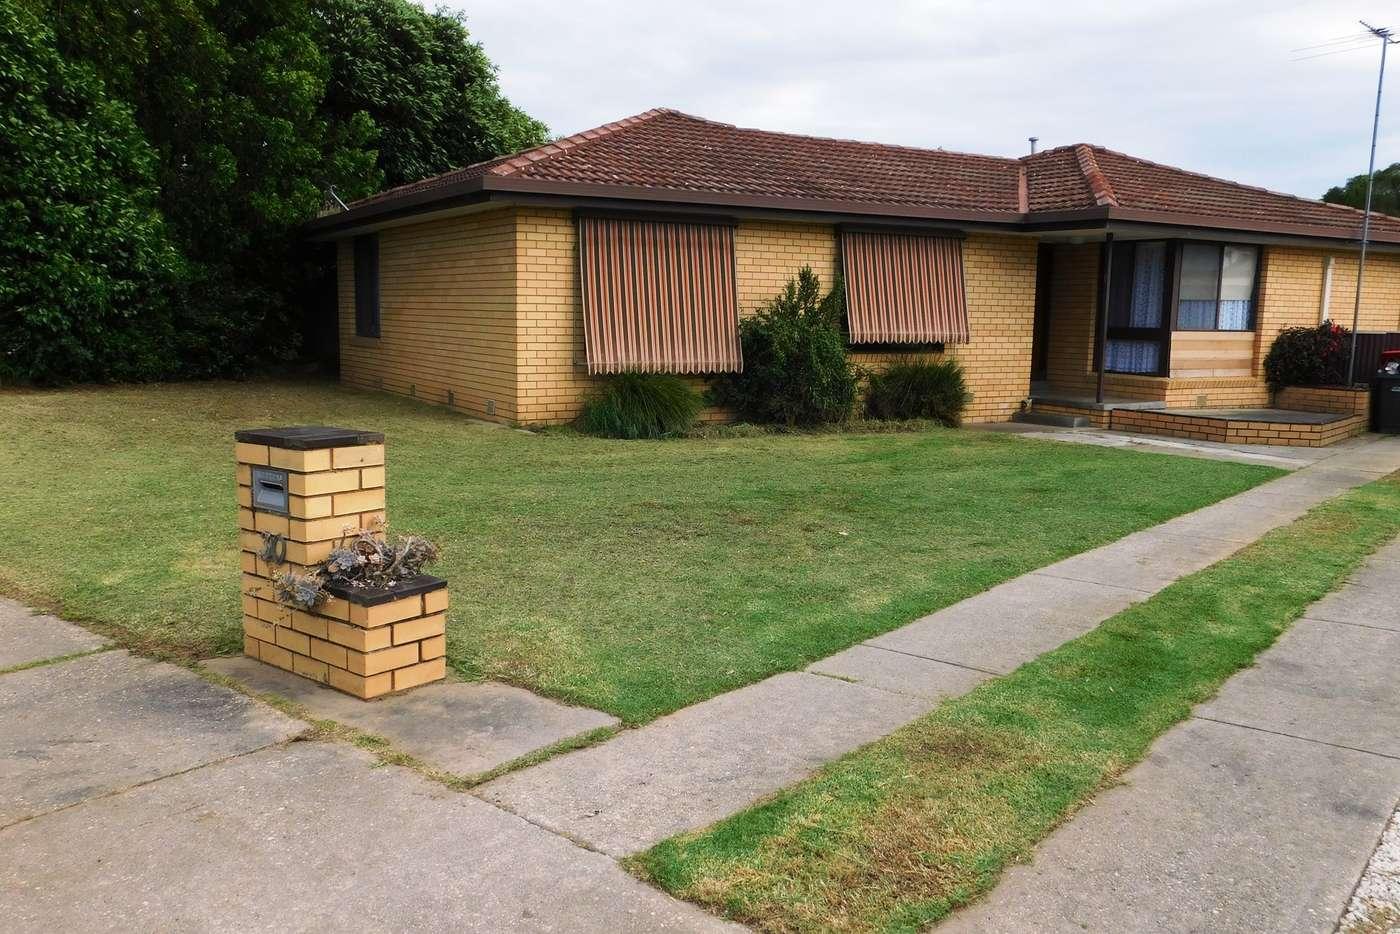 Main view of Homely house listing, 30 Angus Avenue, Wodonga VIC 3690